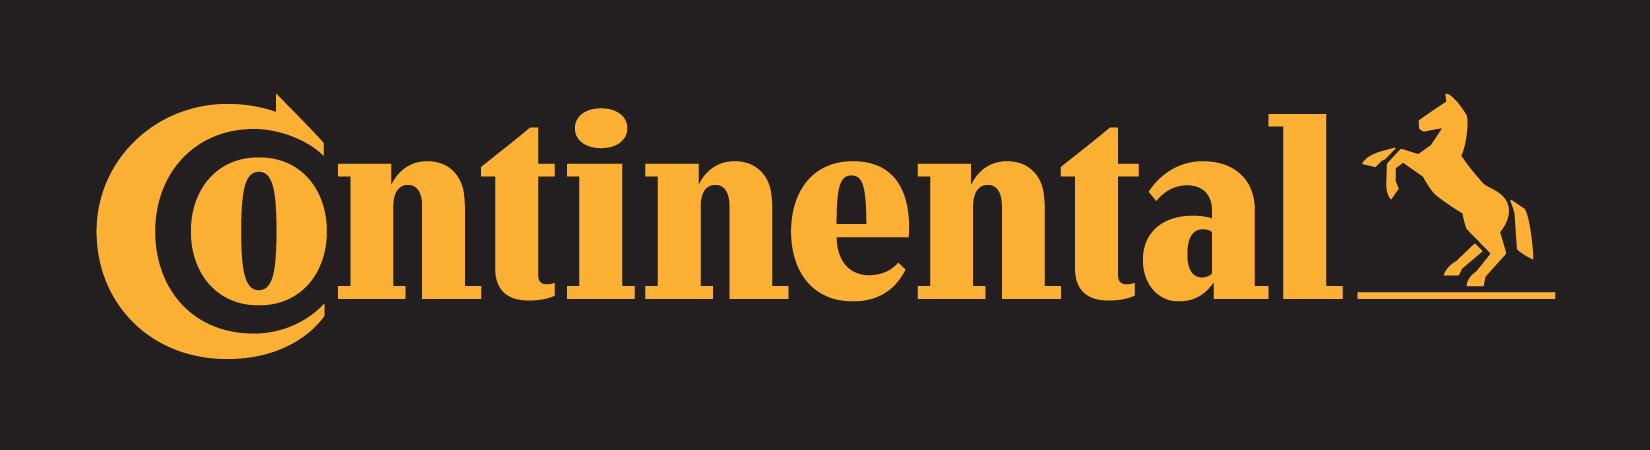 logo-conti-gold-on-black.jpg